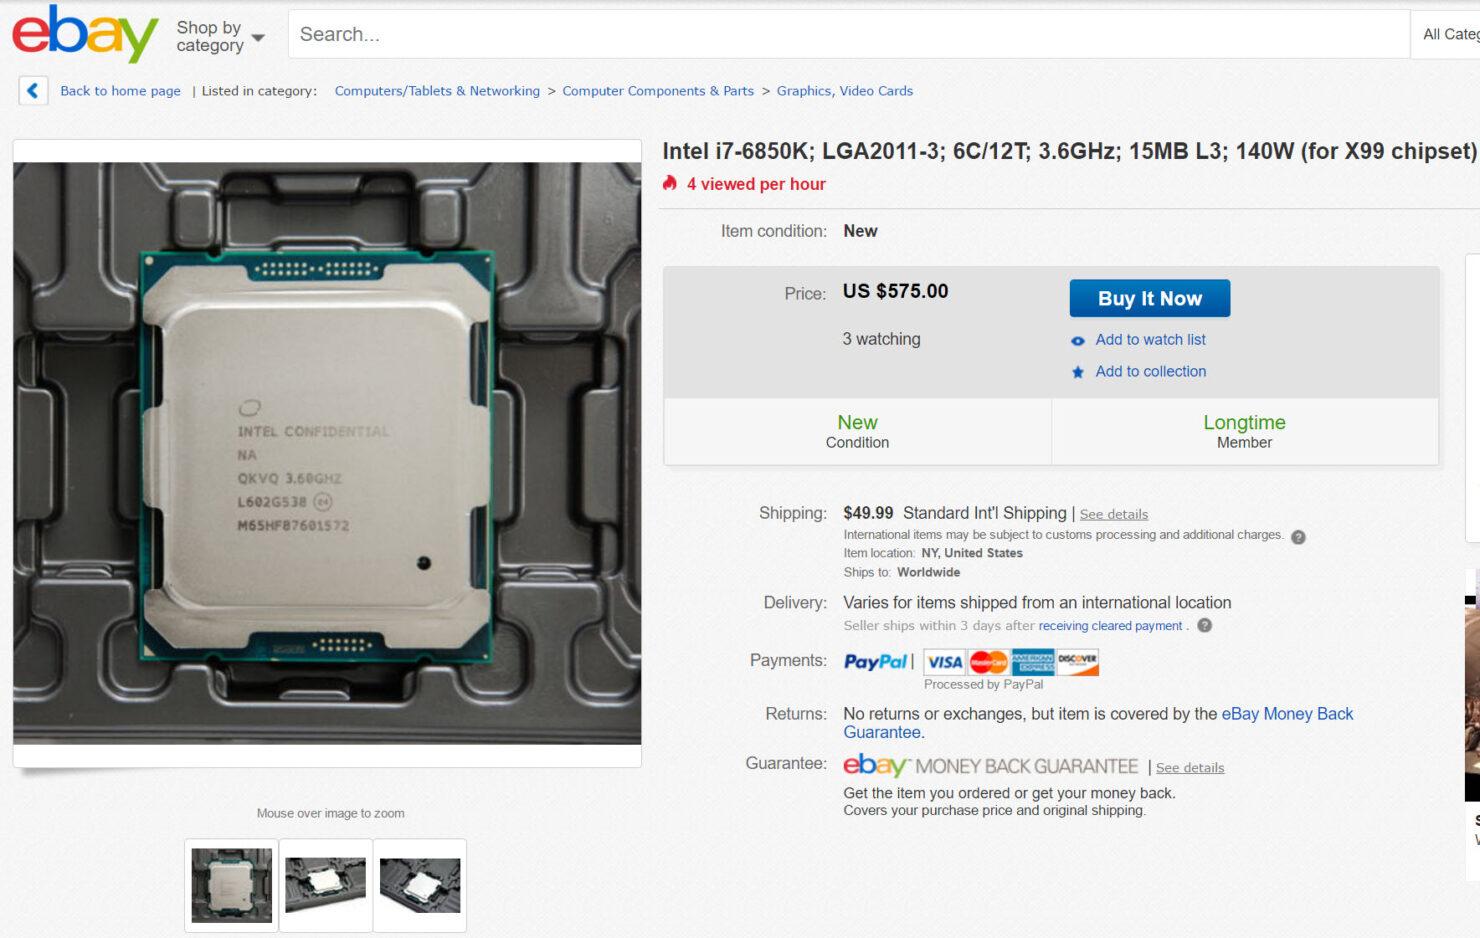 intel-core-i7-6850k-ebay